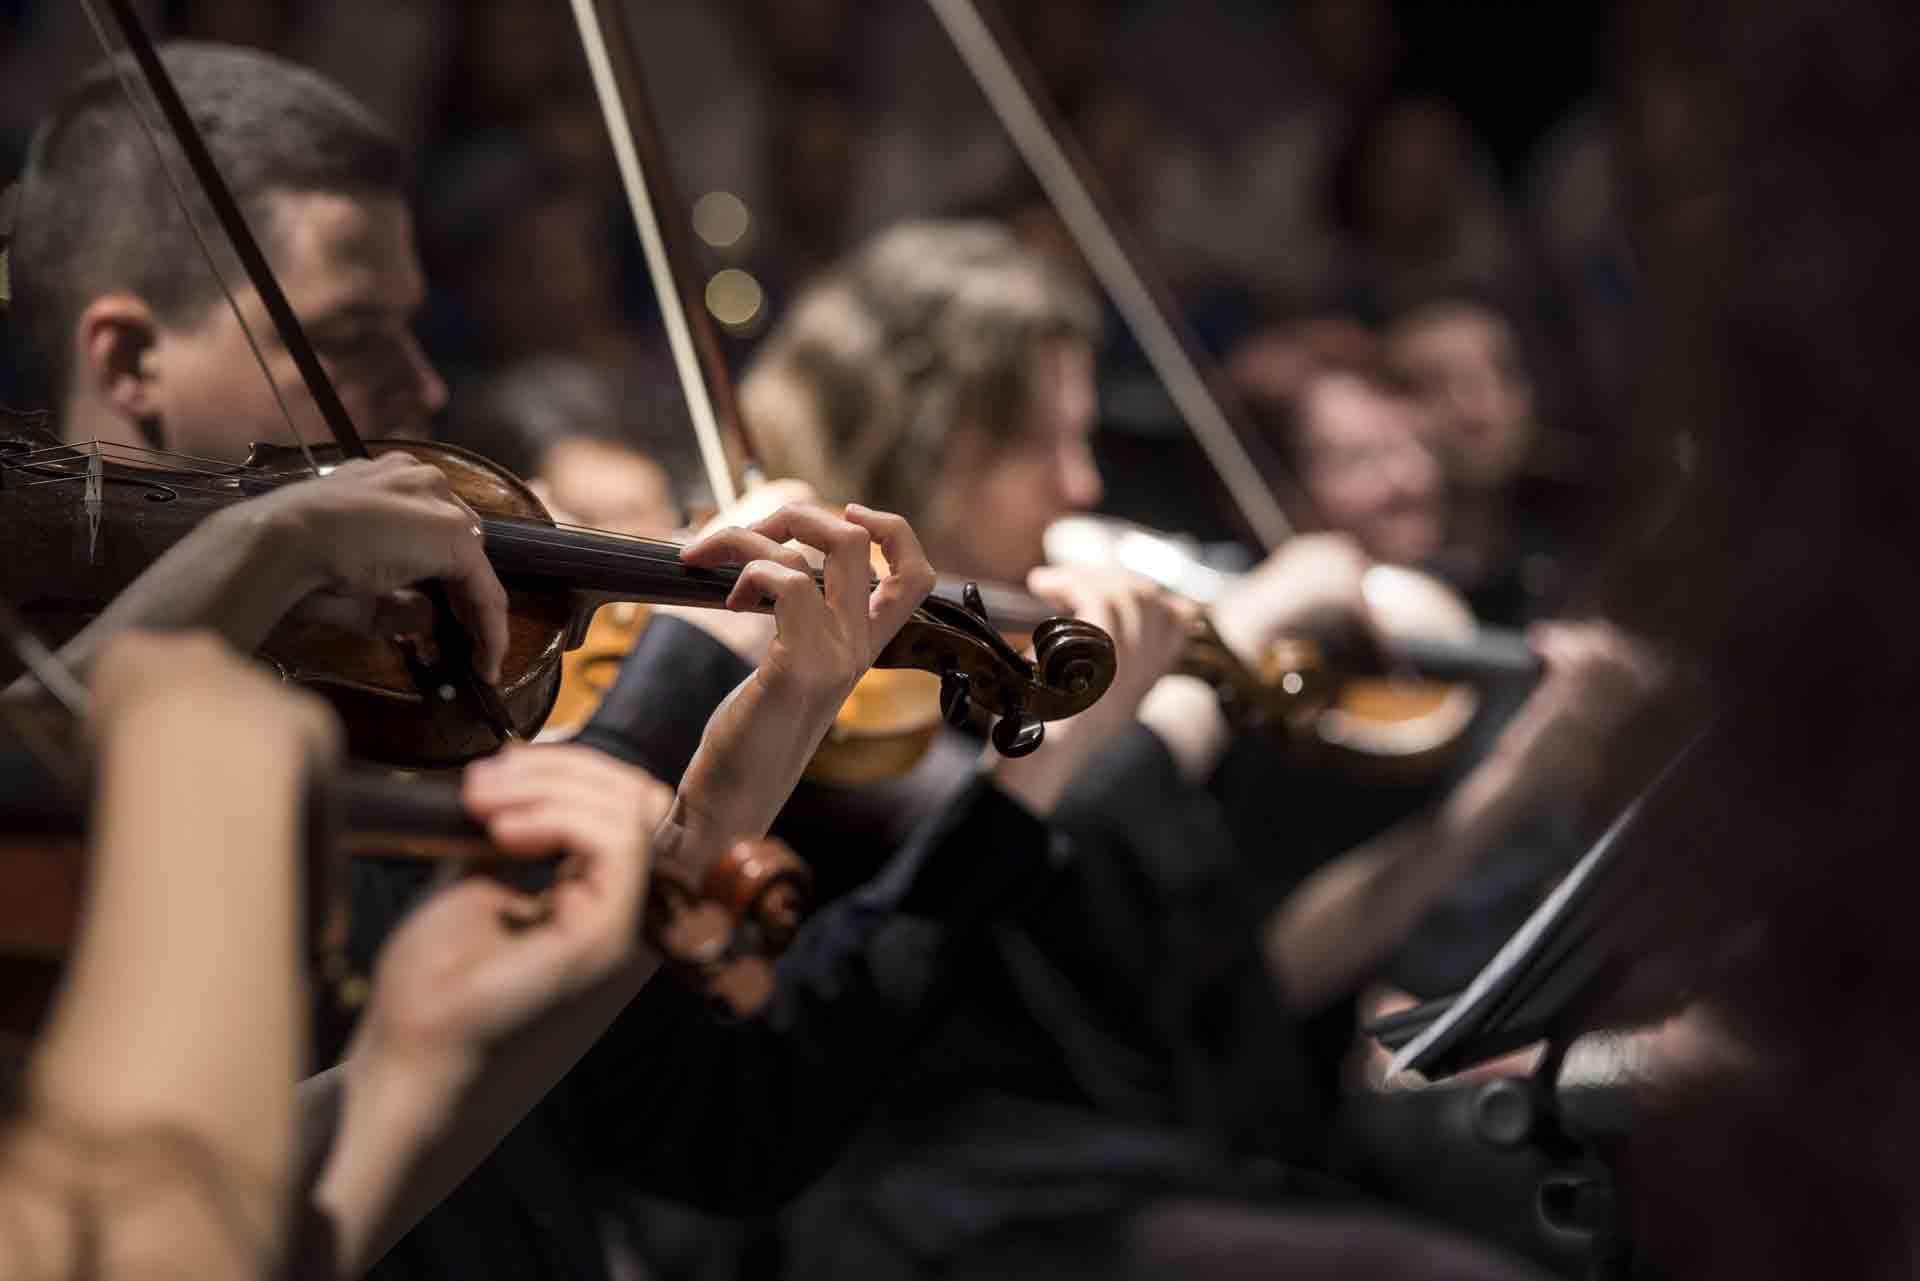 orchestre musiciens classique soiree